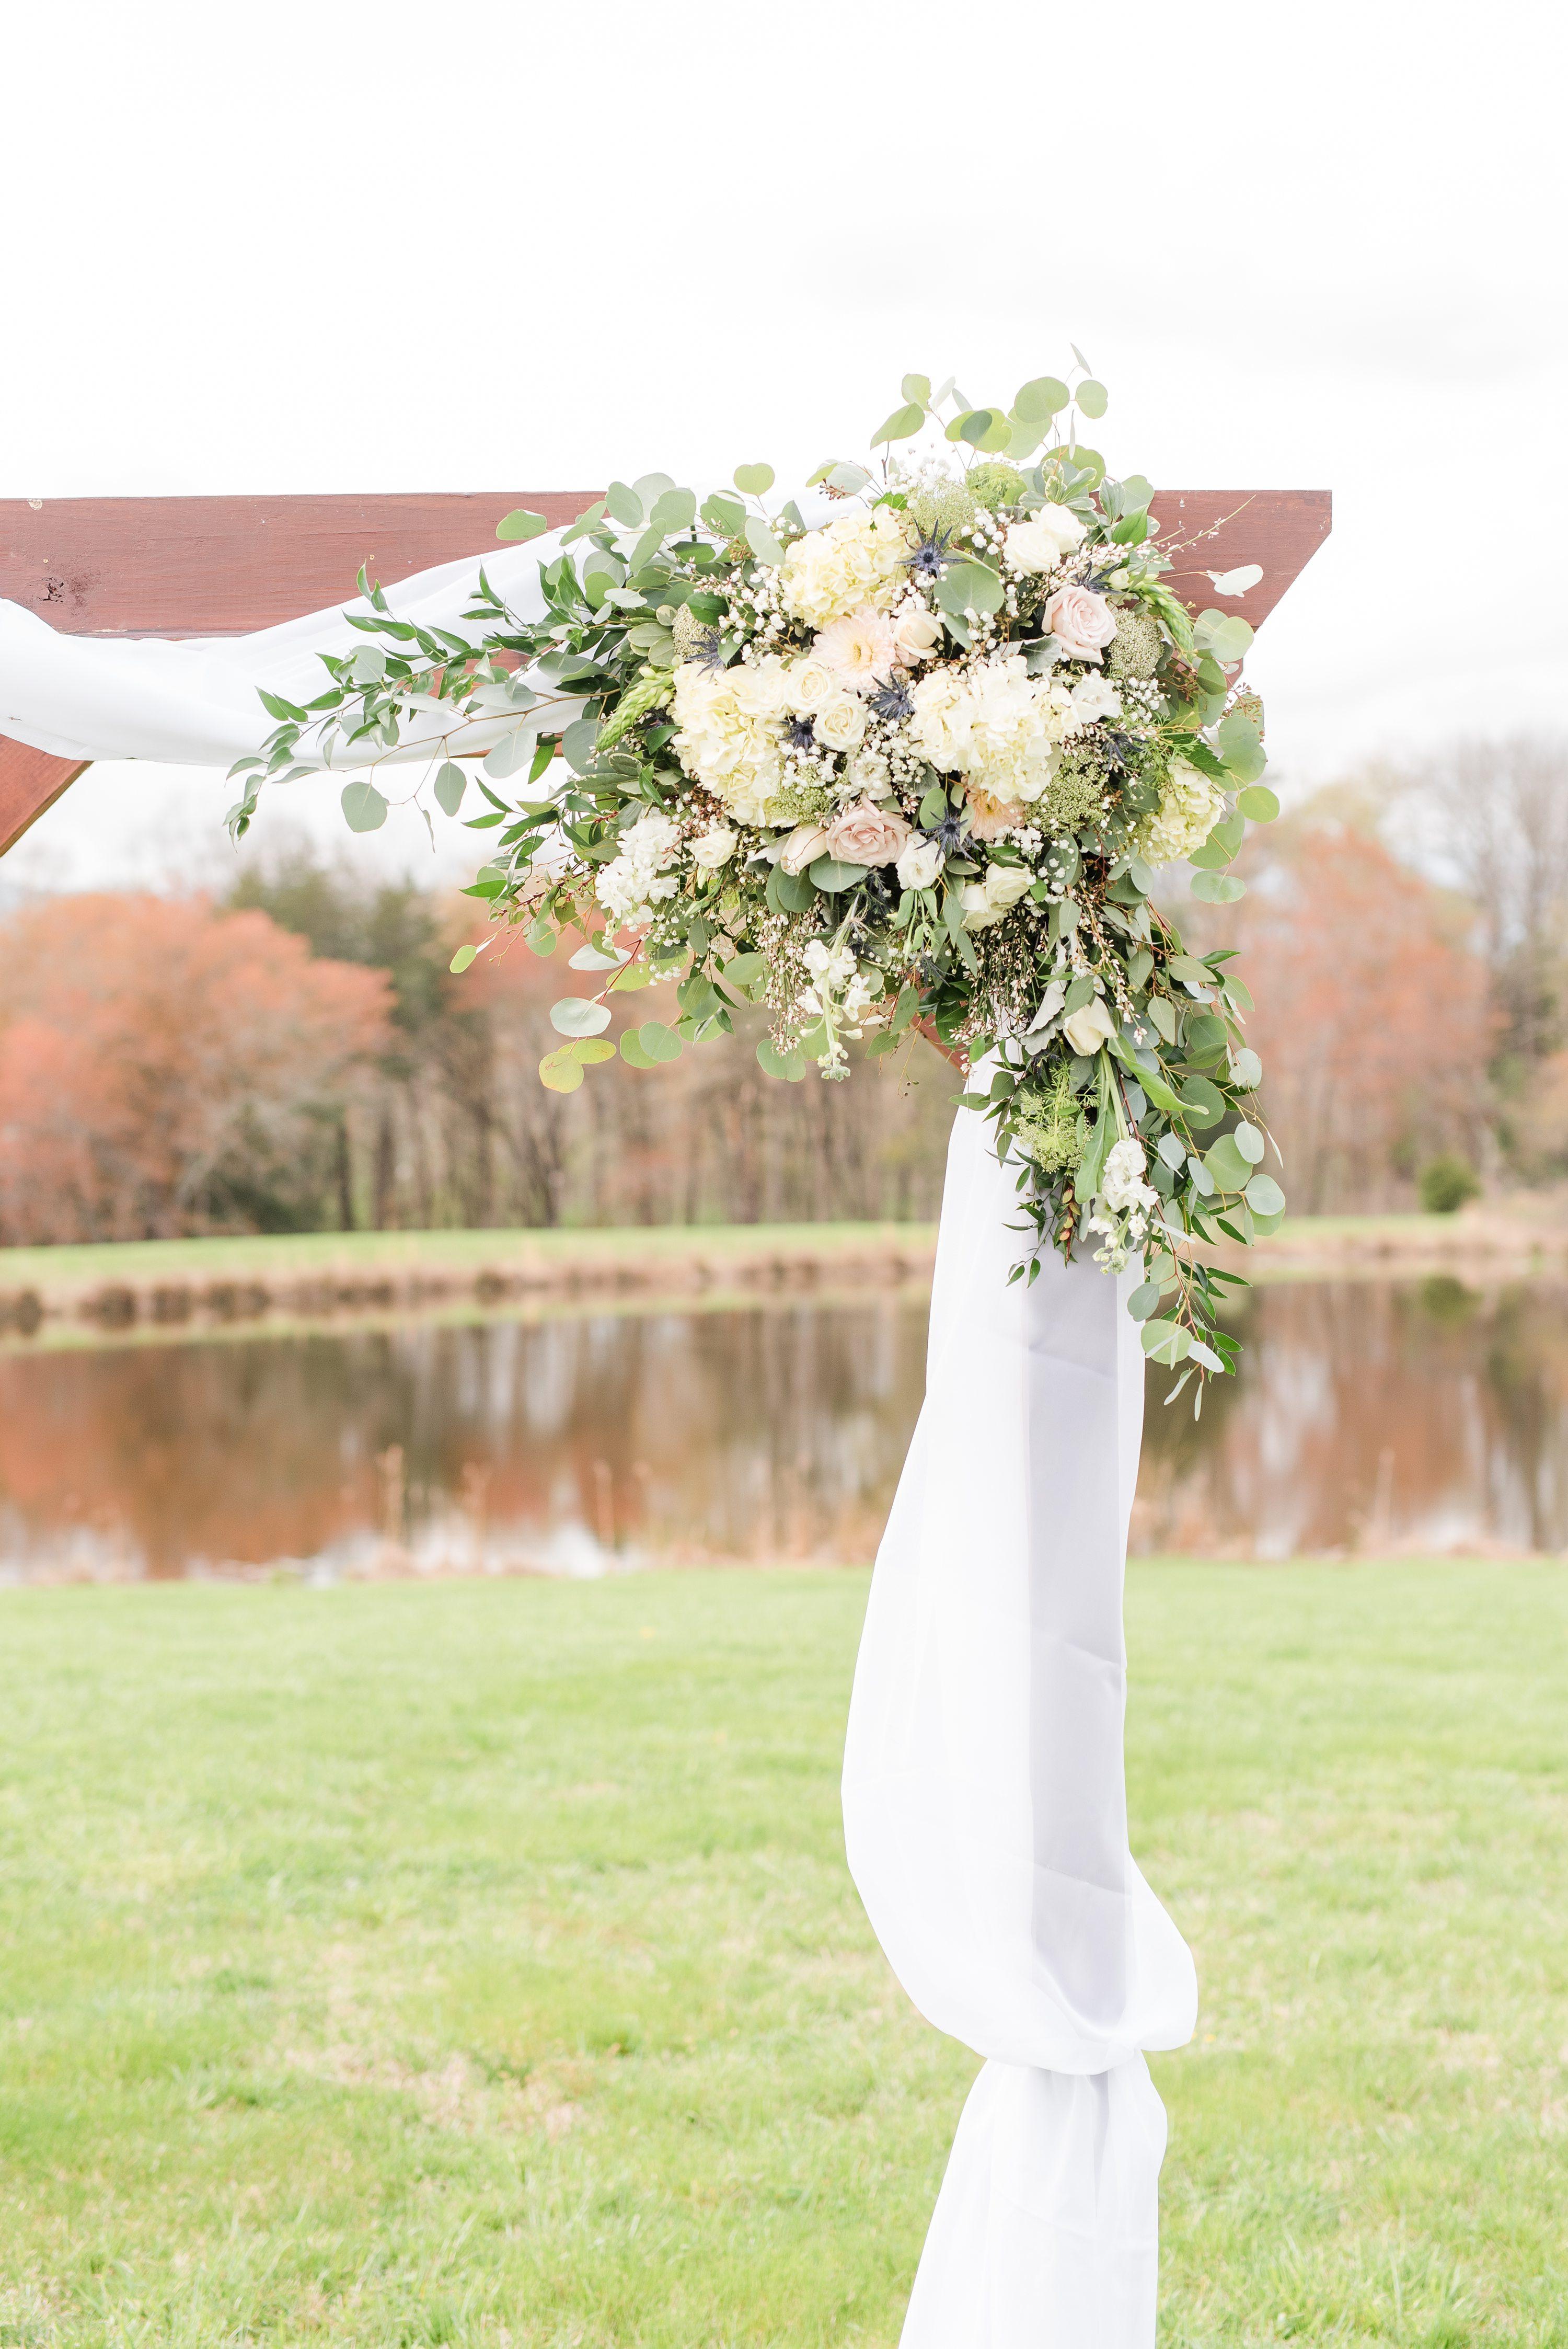 Barn at Edgewood,Barn Wedding,flowers,wedding arbor,arbor,arbor flowers